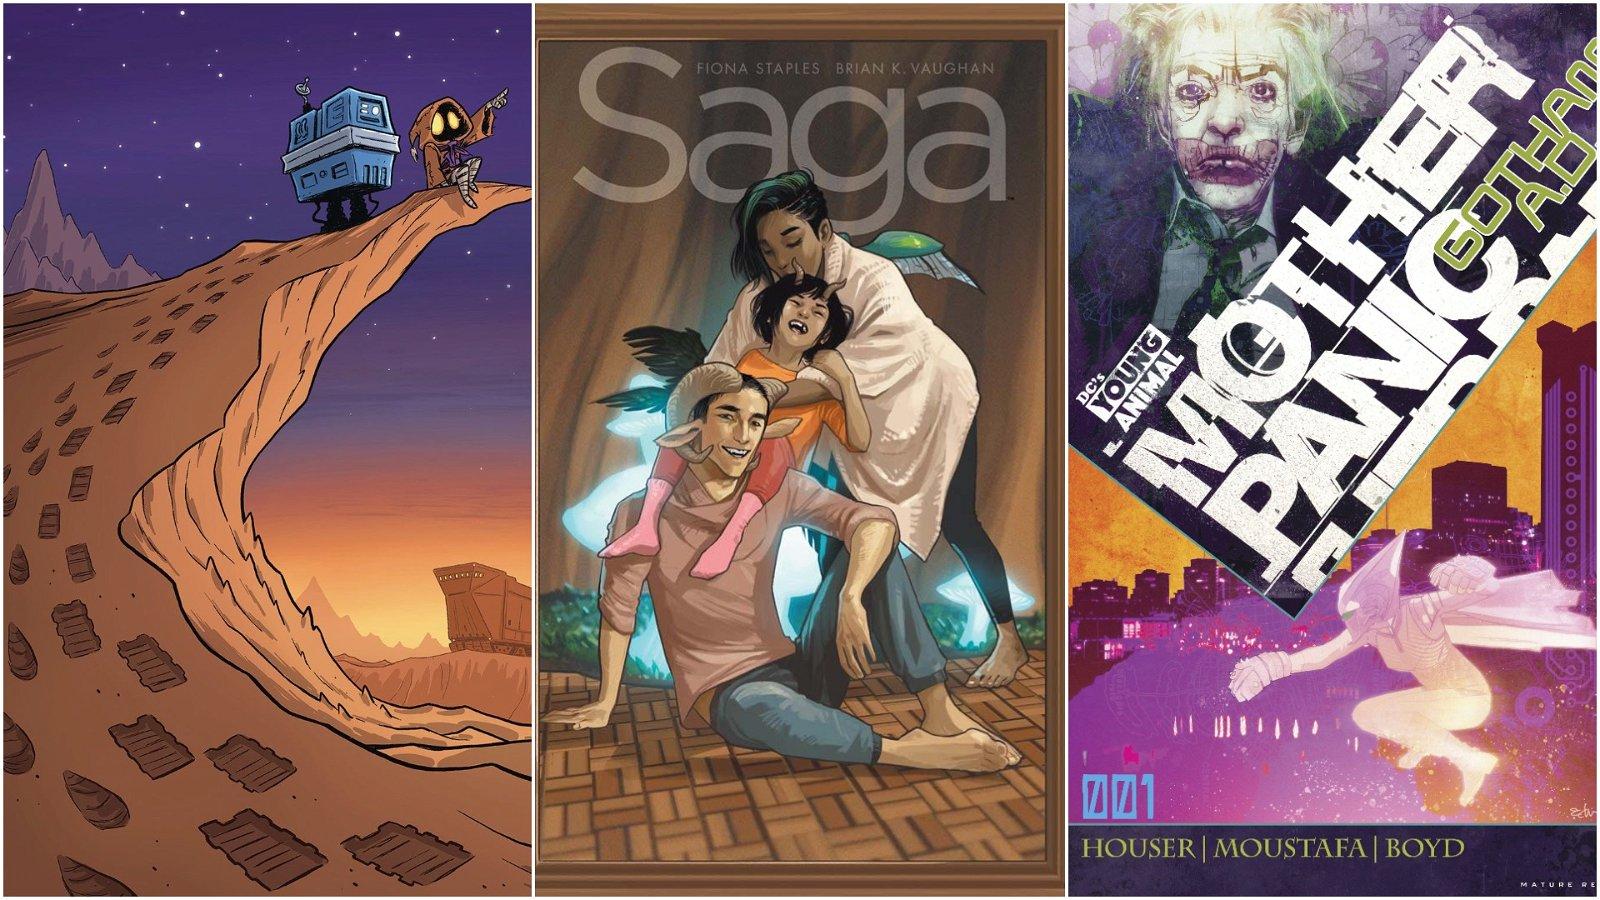 Best Comics to Buy This Week: Saga Celebrates Issue #50